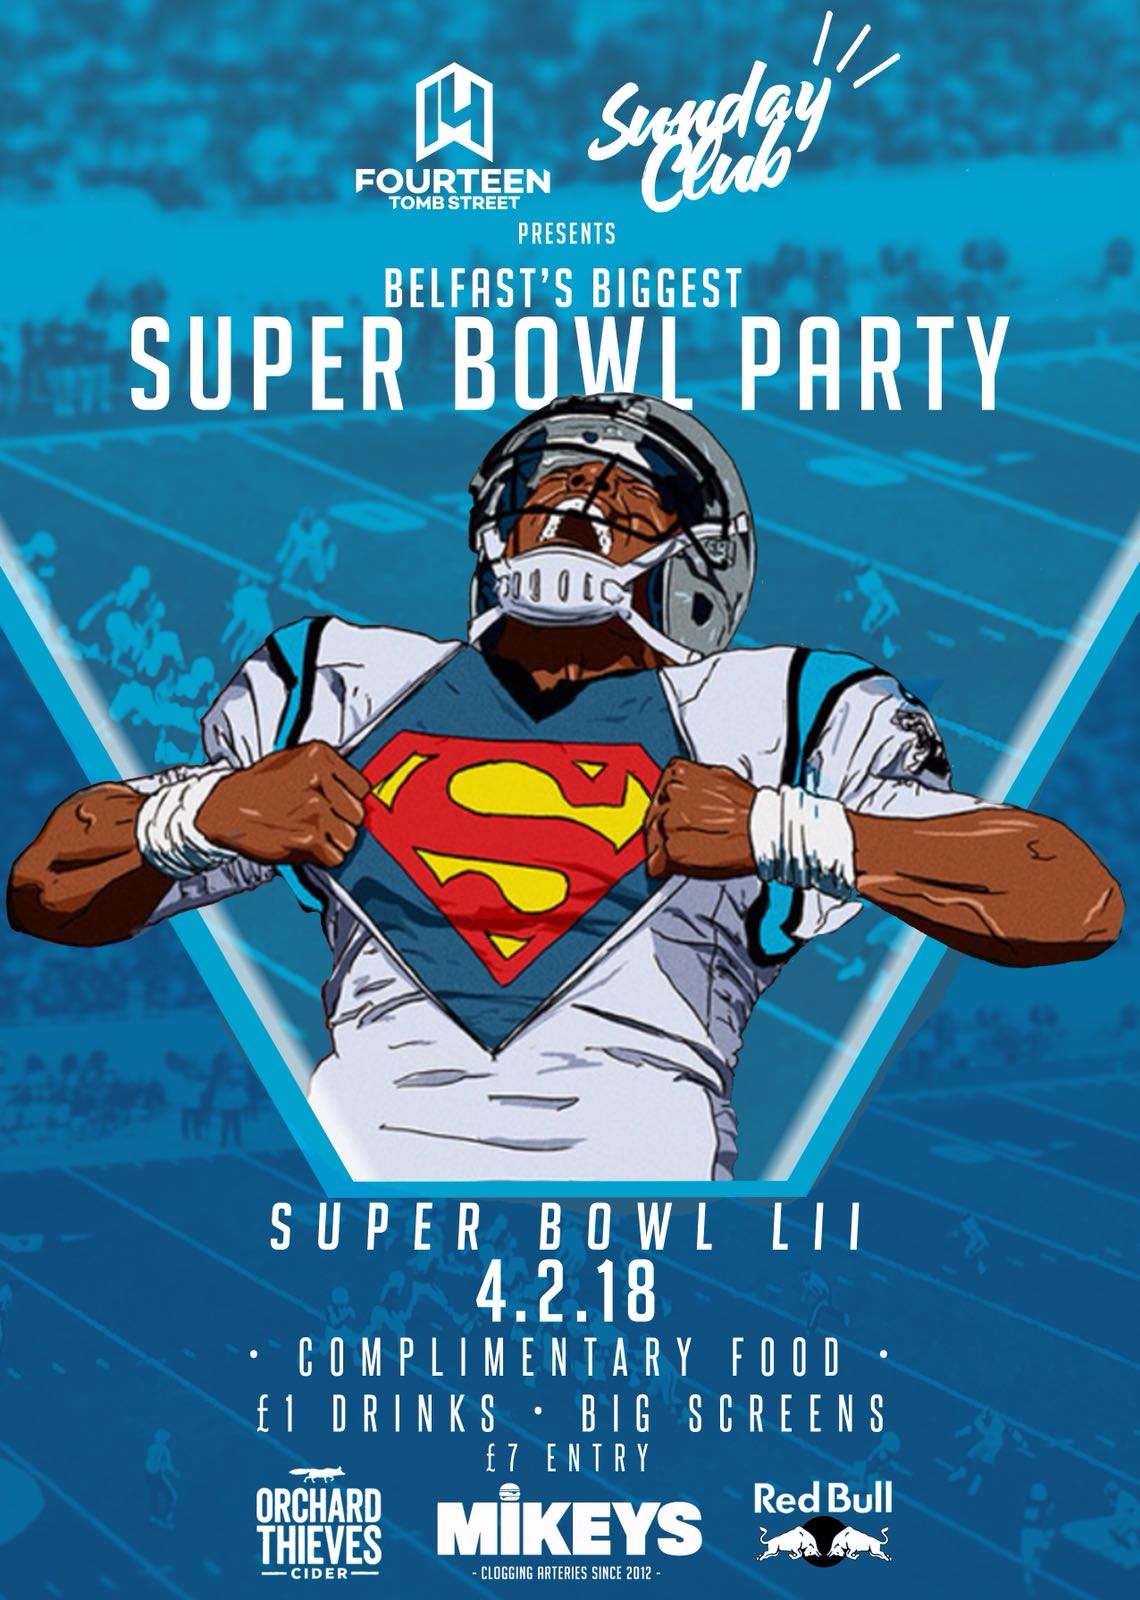 Superbowl_party.JPG